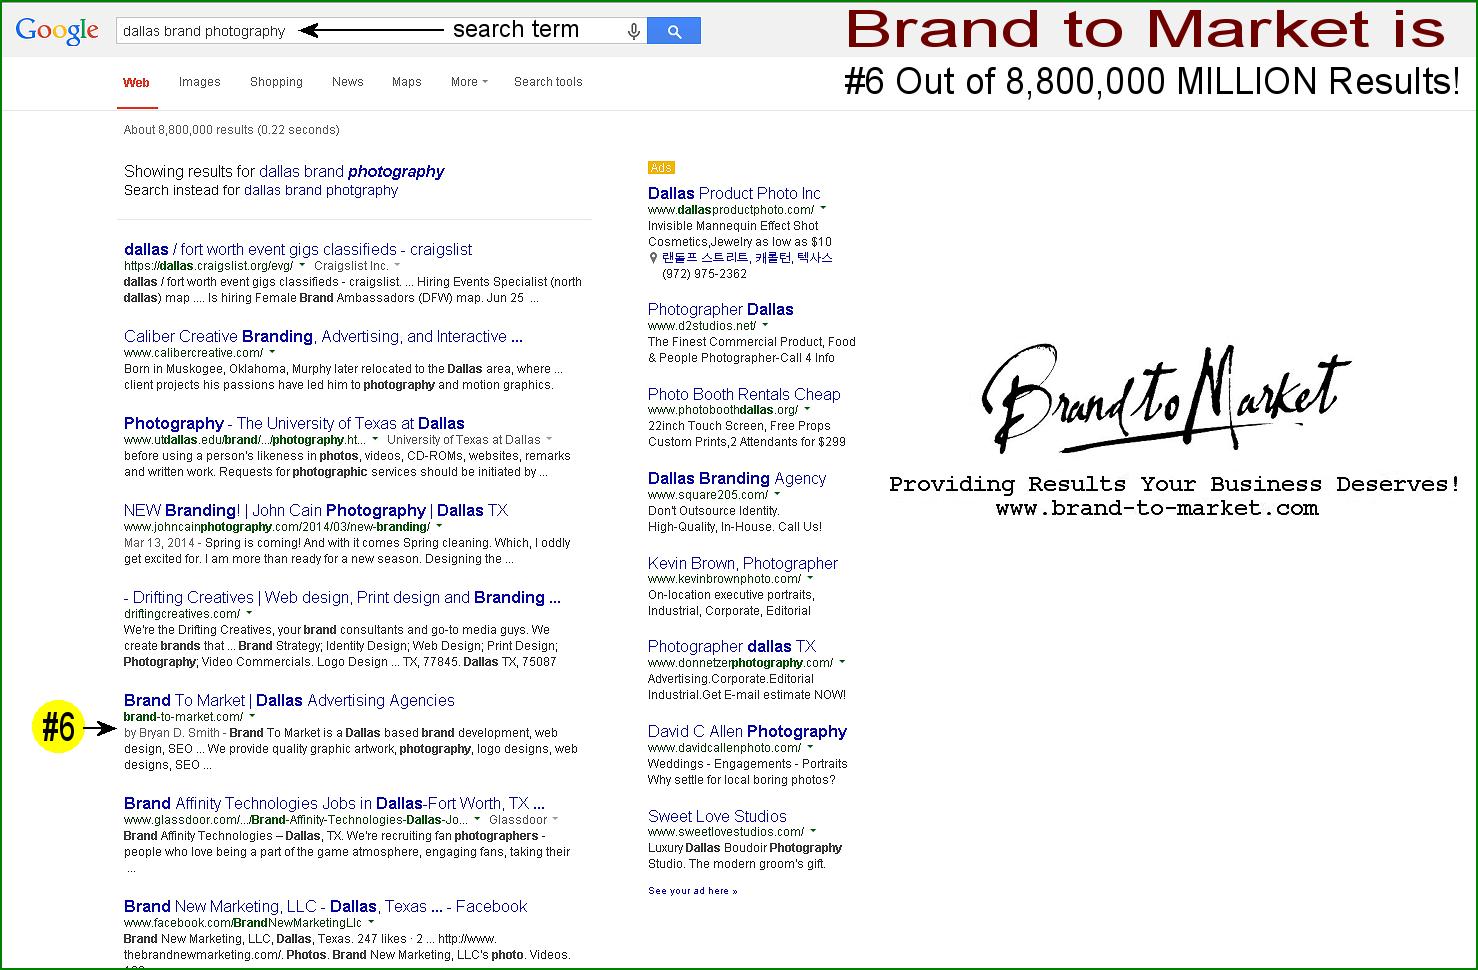 Google Results - Dallas Brand Photography